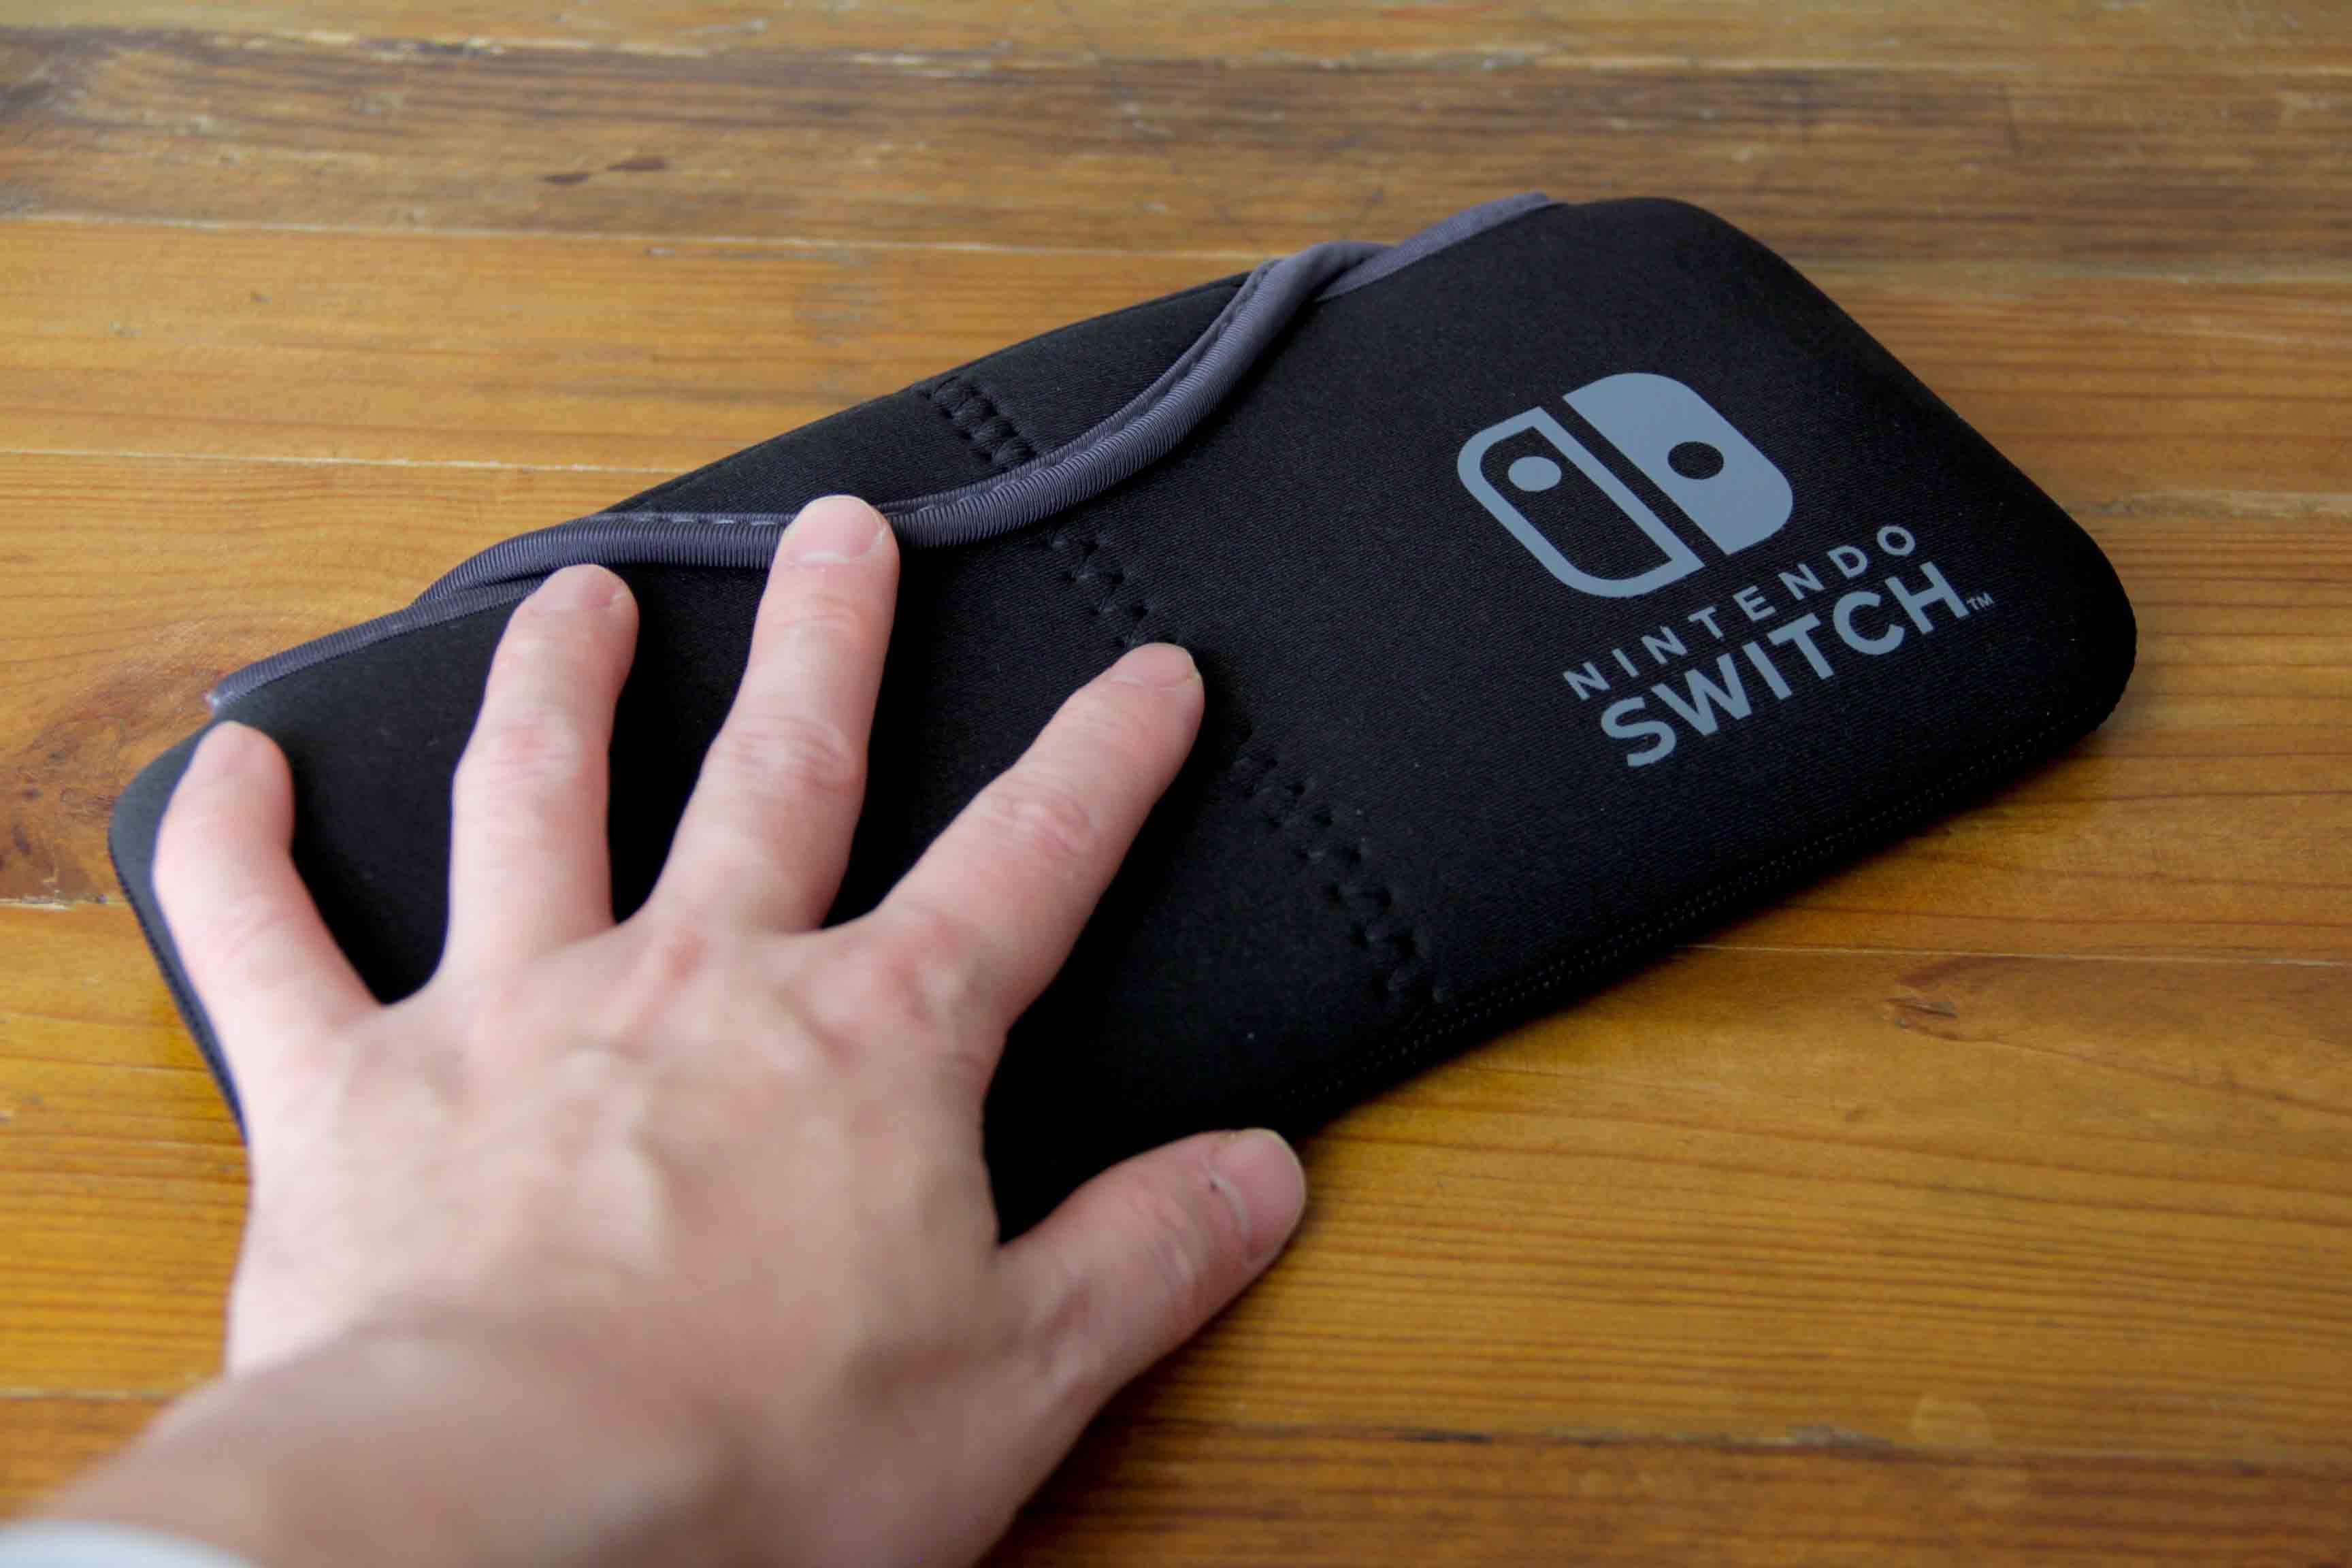 Nintendo switchと専用ケースポーチ|QUICK POUCHの全体写真